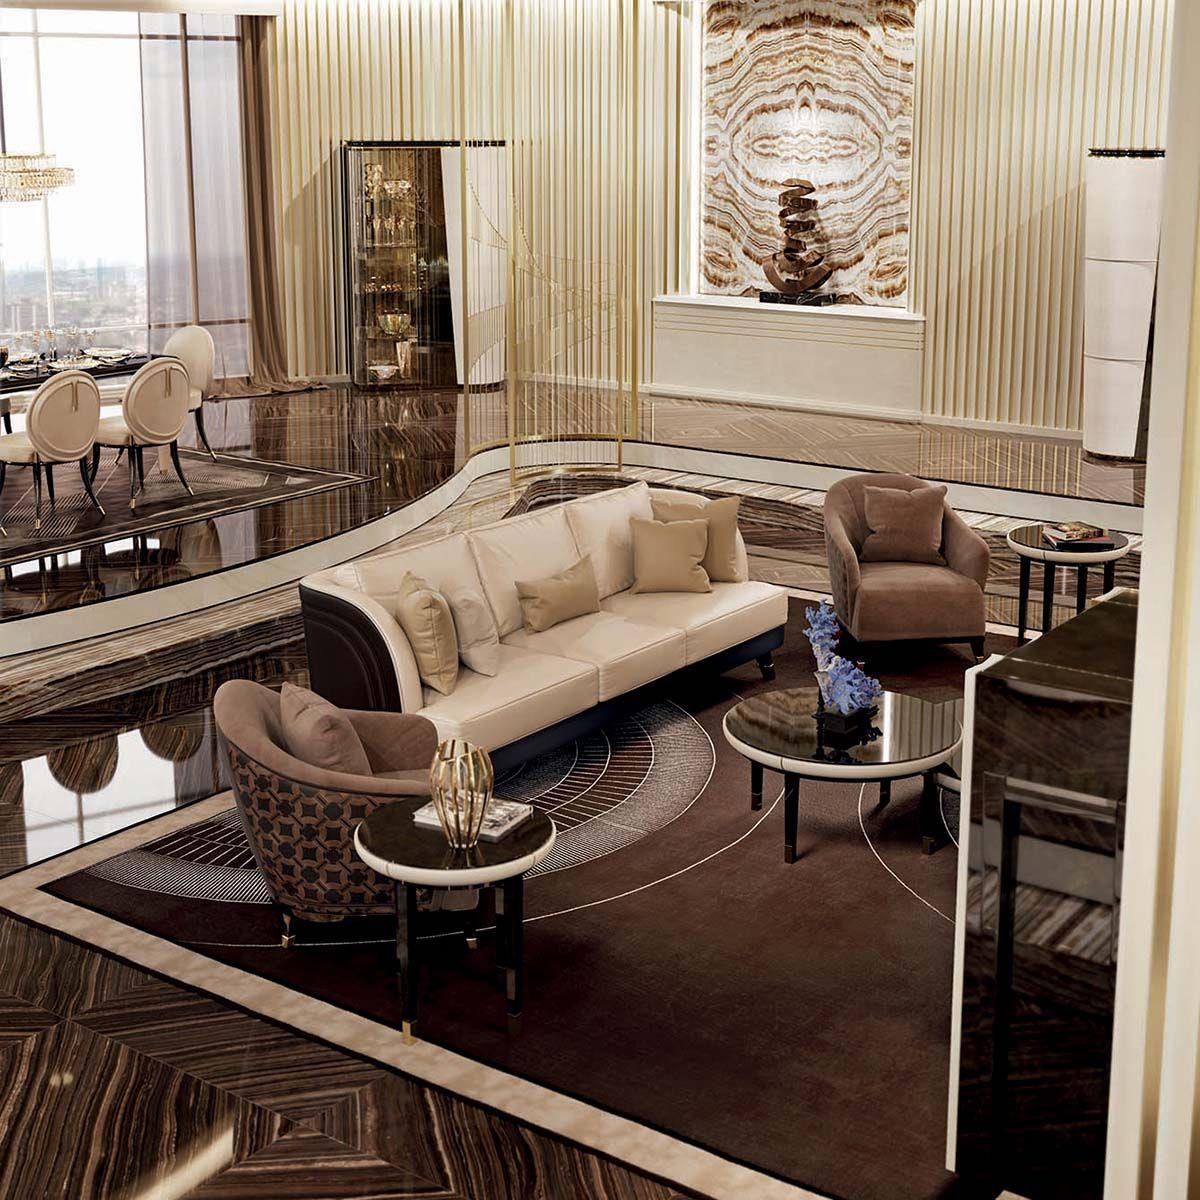 Noir Collection Www.turri.it Italian Luxury Living Room Furniture Part 85